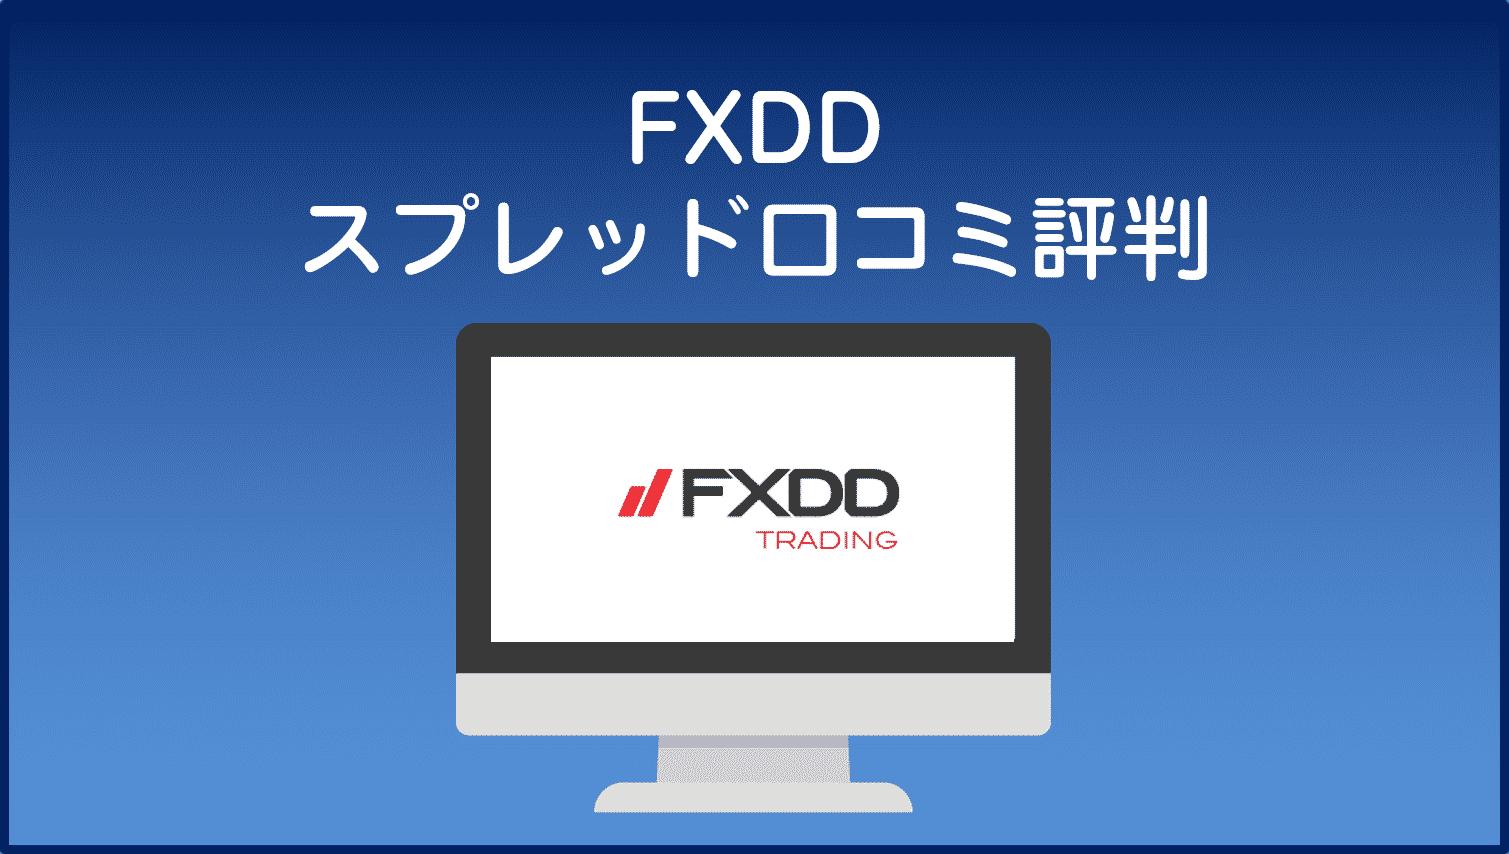 FXDDスプレッド口コミ・評判